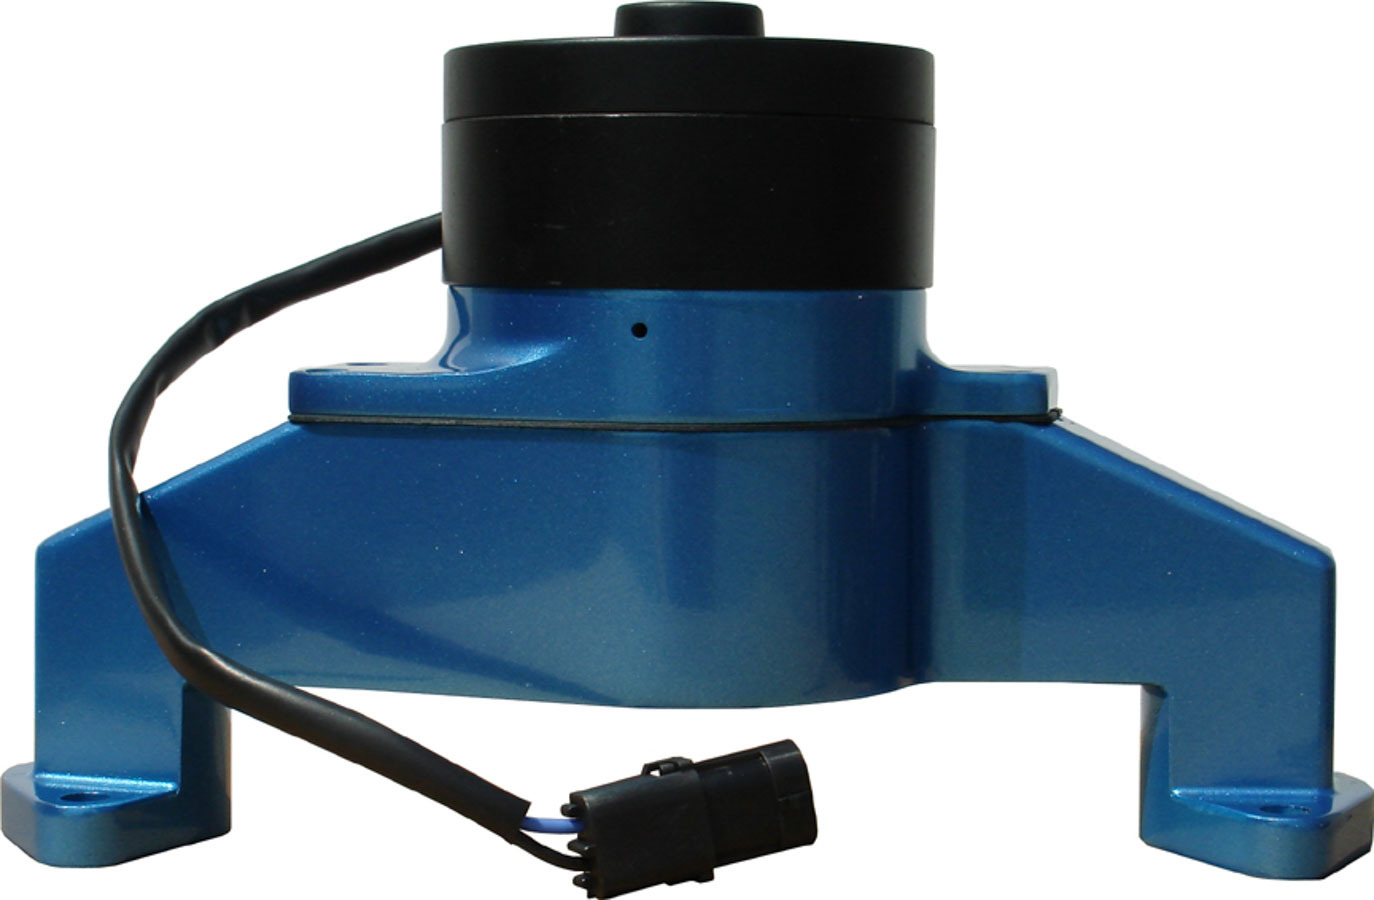 Proform BBC Electric Water Pump - Blue